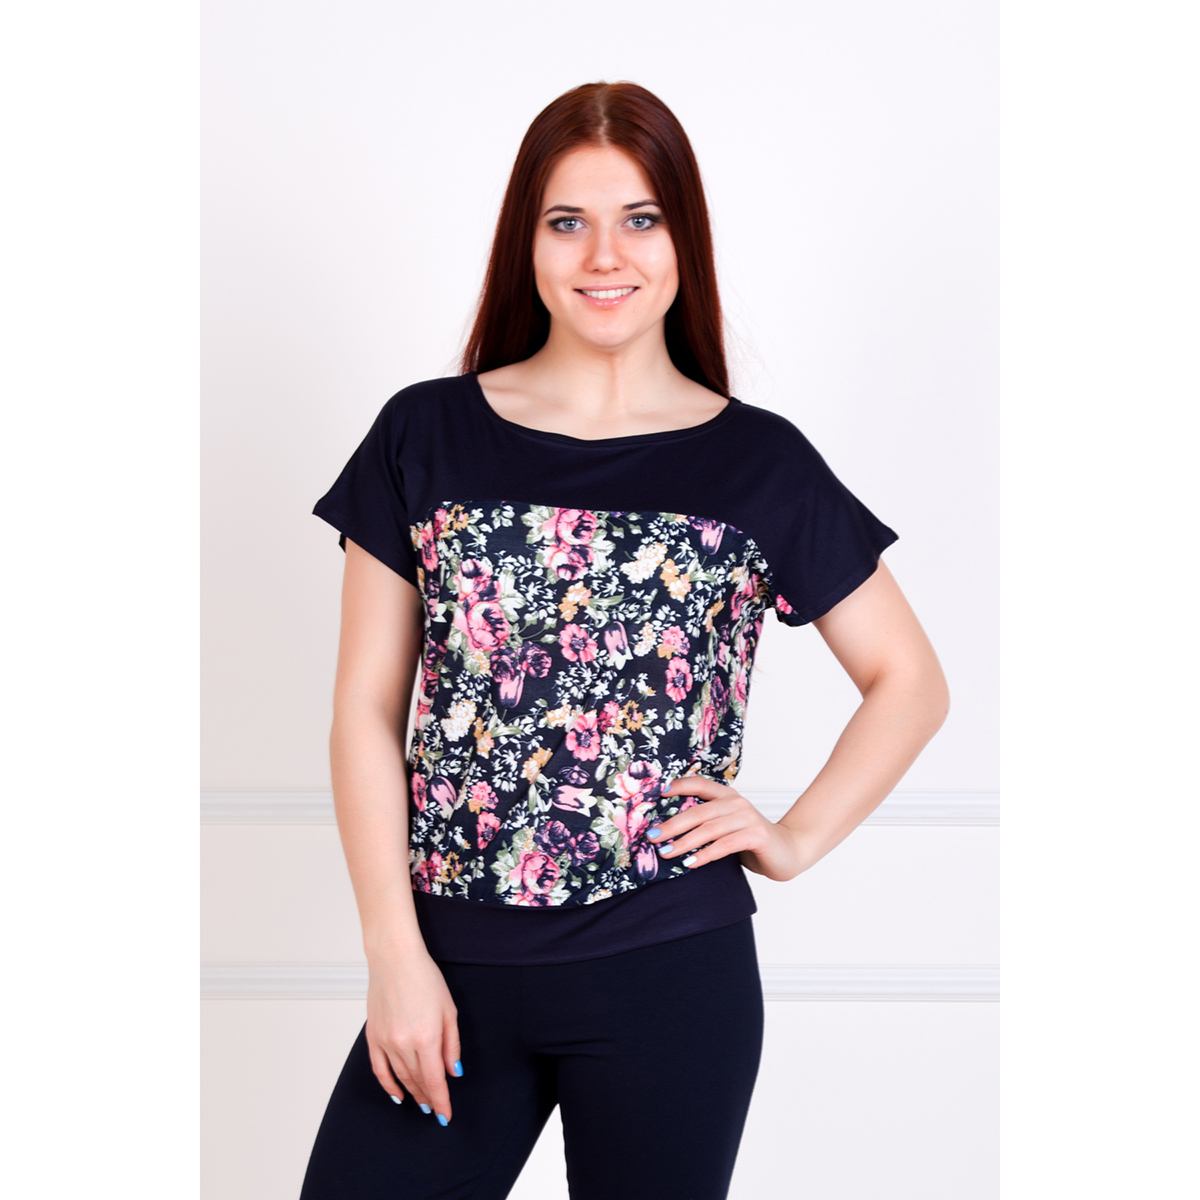 Женская блуза Ангелина арт. 0287, размер 54Блузы<br>Обхват груди: 108 см <br>Обхват талии: 88 см <br>Обхват бедер: 116 см <br>Рост: 167 см<br><br>Тип: Жен. блуза<br>Размер: 54<br>Материал: Масло